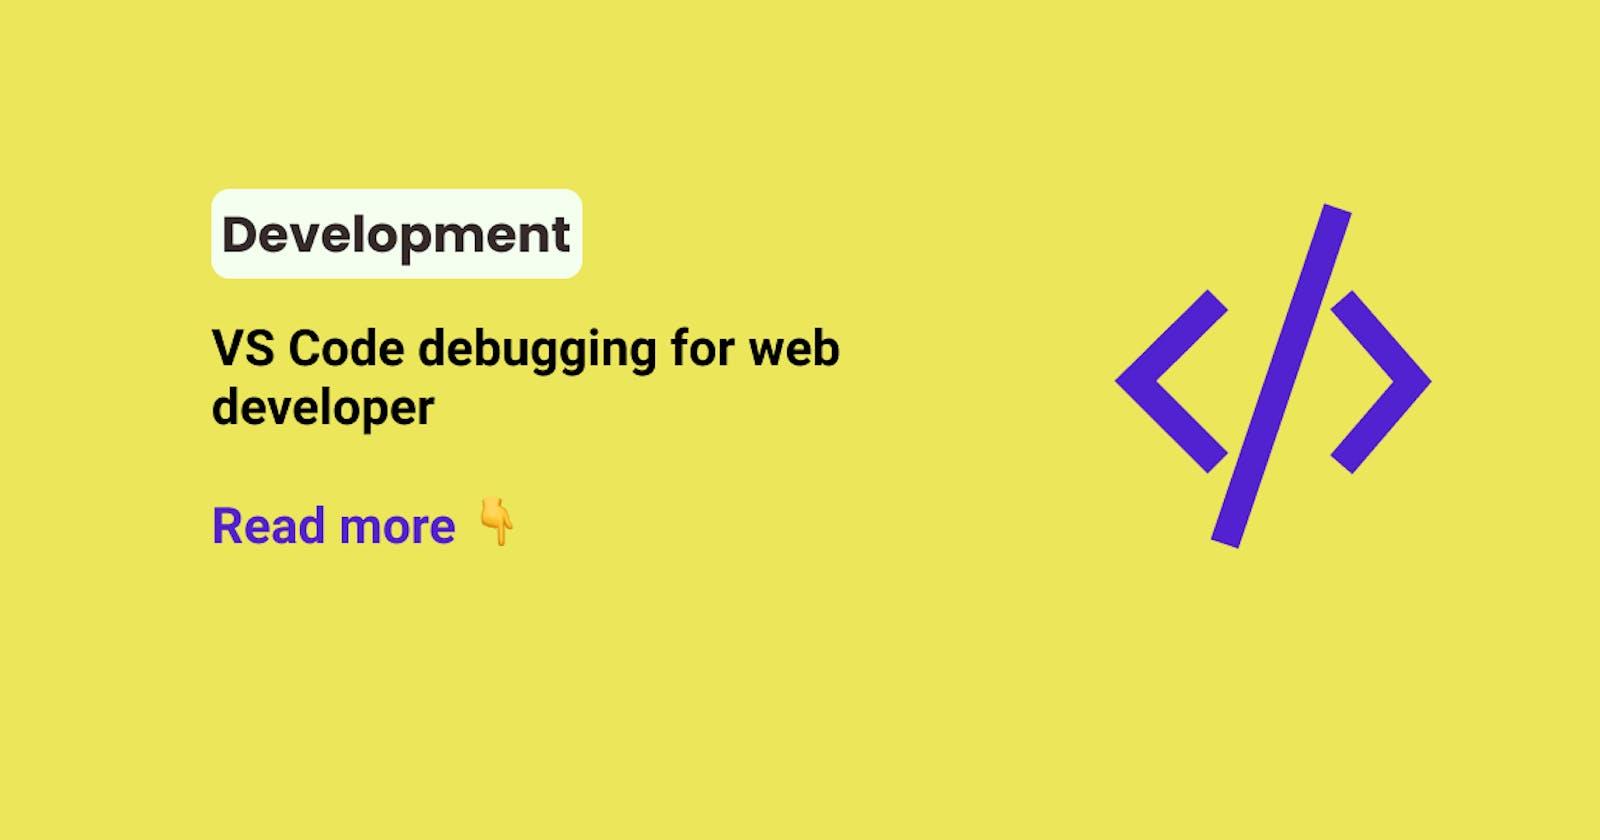 VS Code debugging for web developer